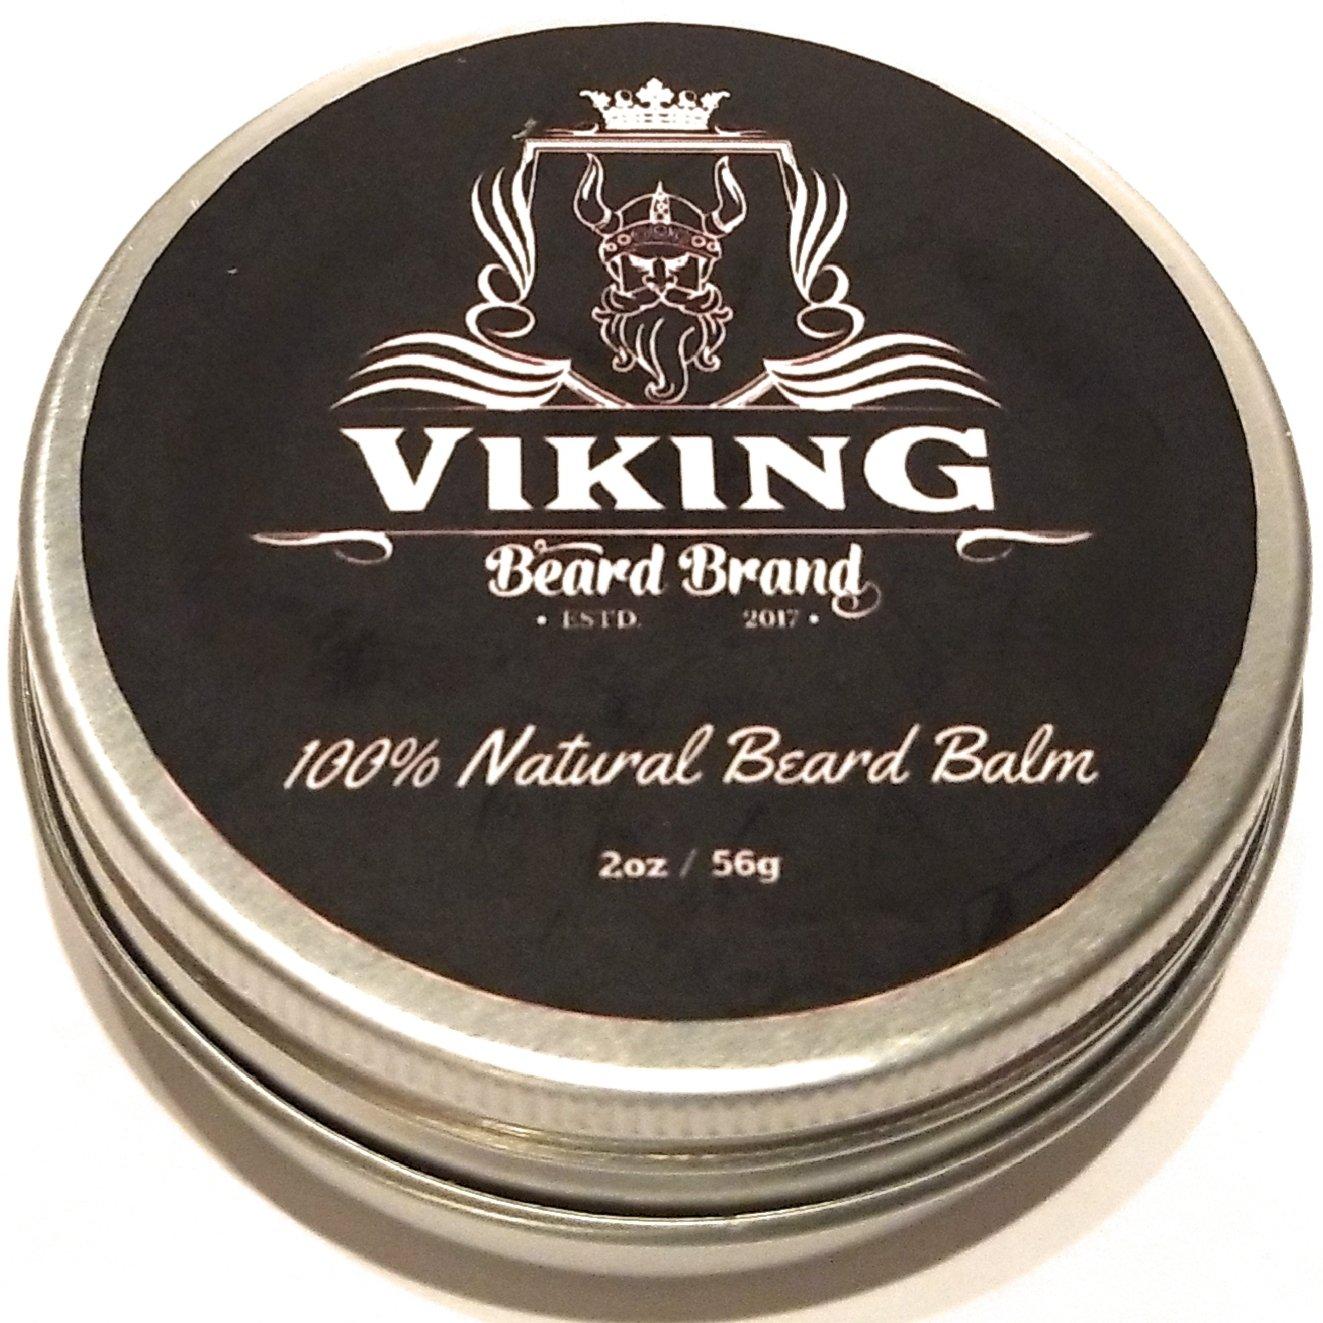 Beard Balm – Organic 100% All Natural Beard Conditioner, Bees Wax, Jojoba Oil, Argan Oil, Mango Butter, Style, Moisturize & Soften Beard or Mustache During Growth, Citrus Fragrance for Men - 2oz Viking Beard Brand